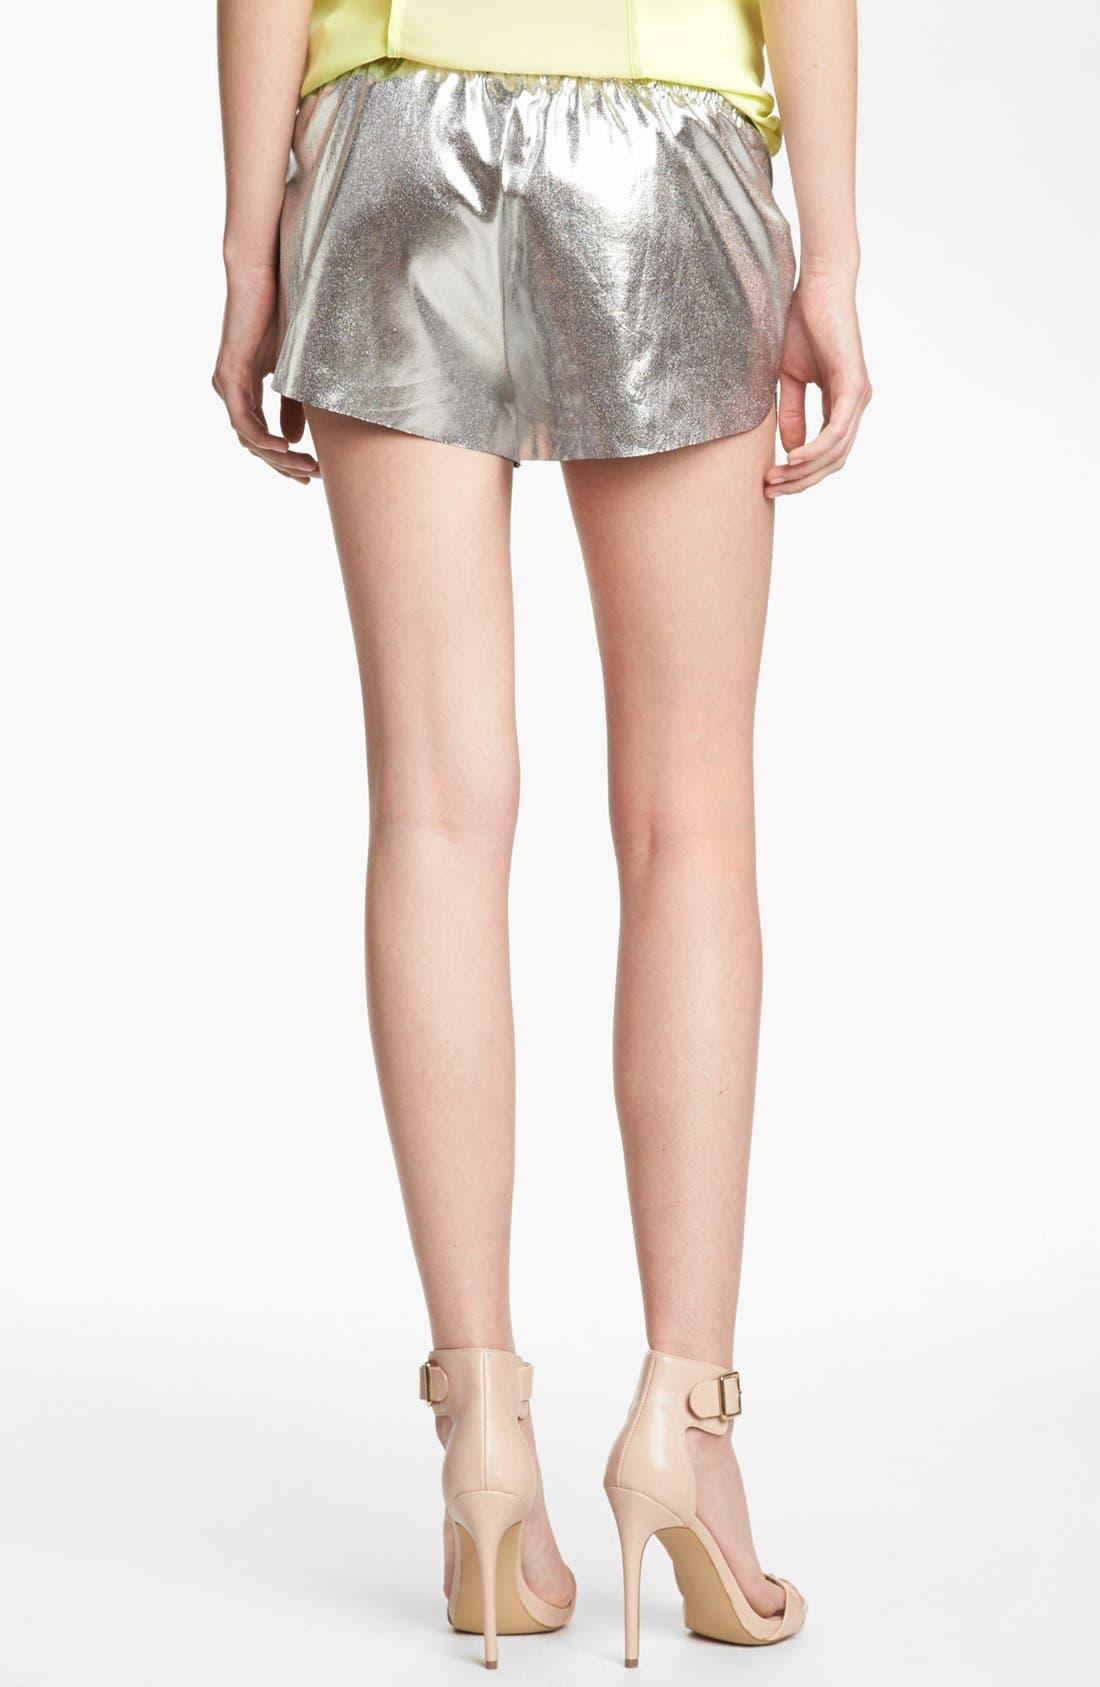 LEITH, 'Cosmic' Metallic Tap Shorts, Alternate thumbnail 2, color, 040